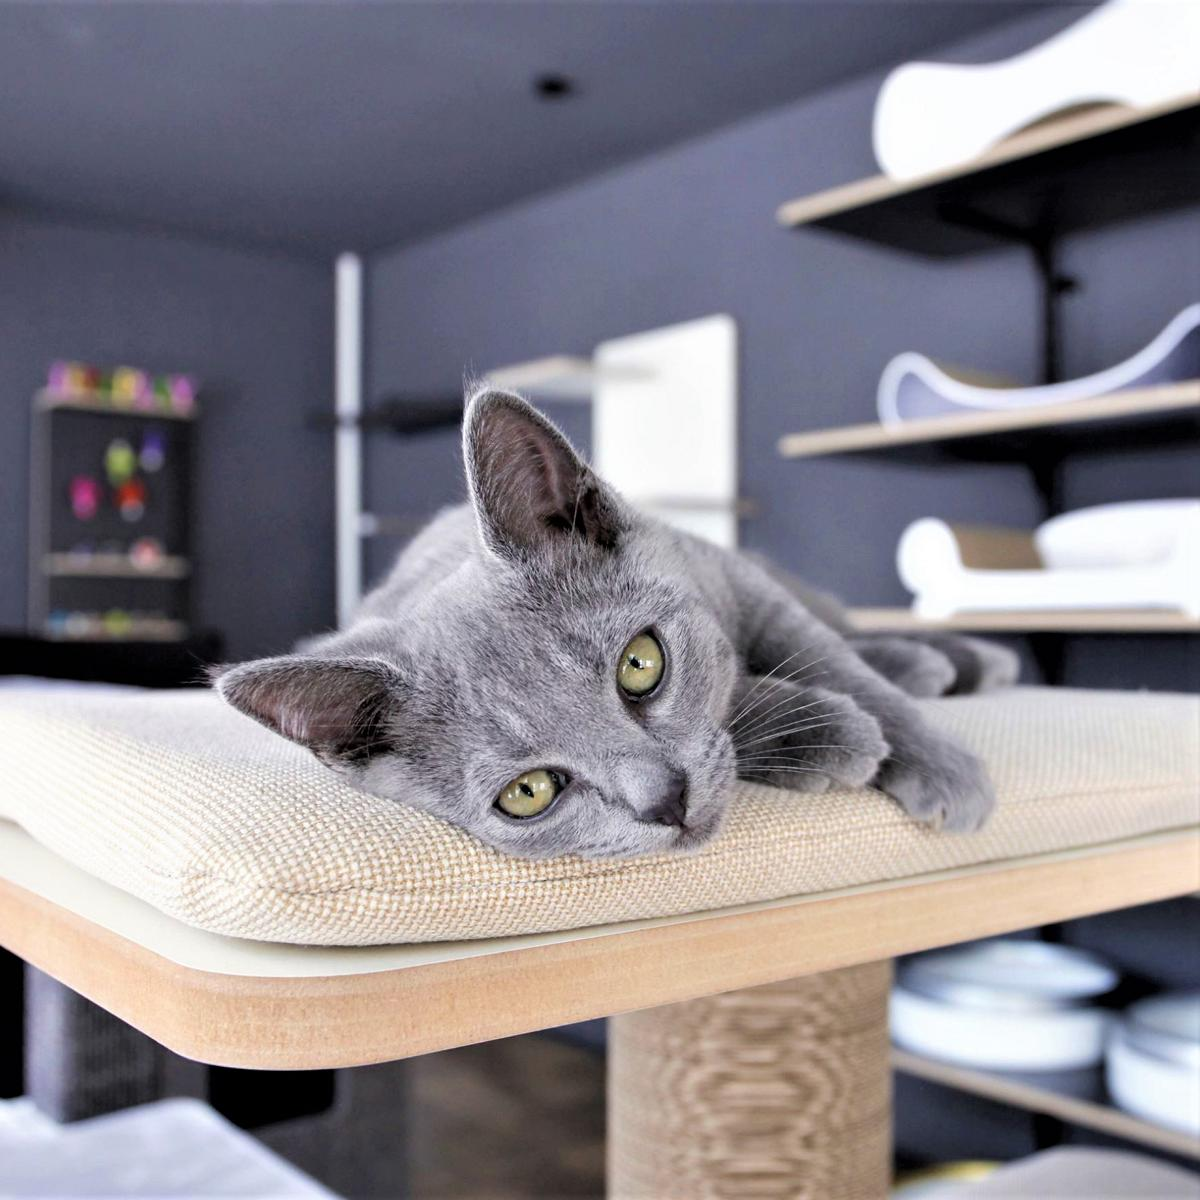 style hannover styleCats 1 - stylecats® - Katzenmöbel